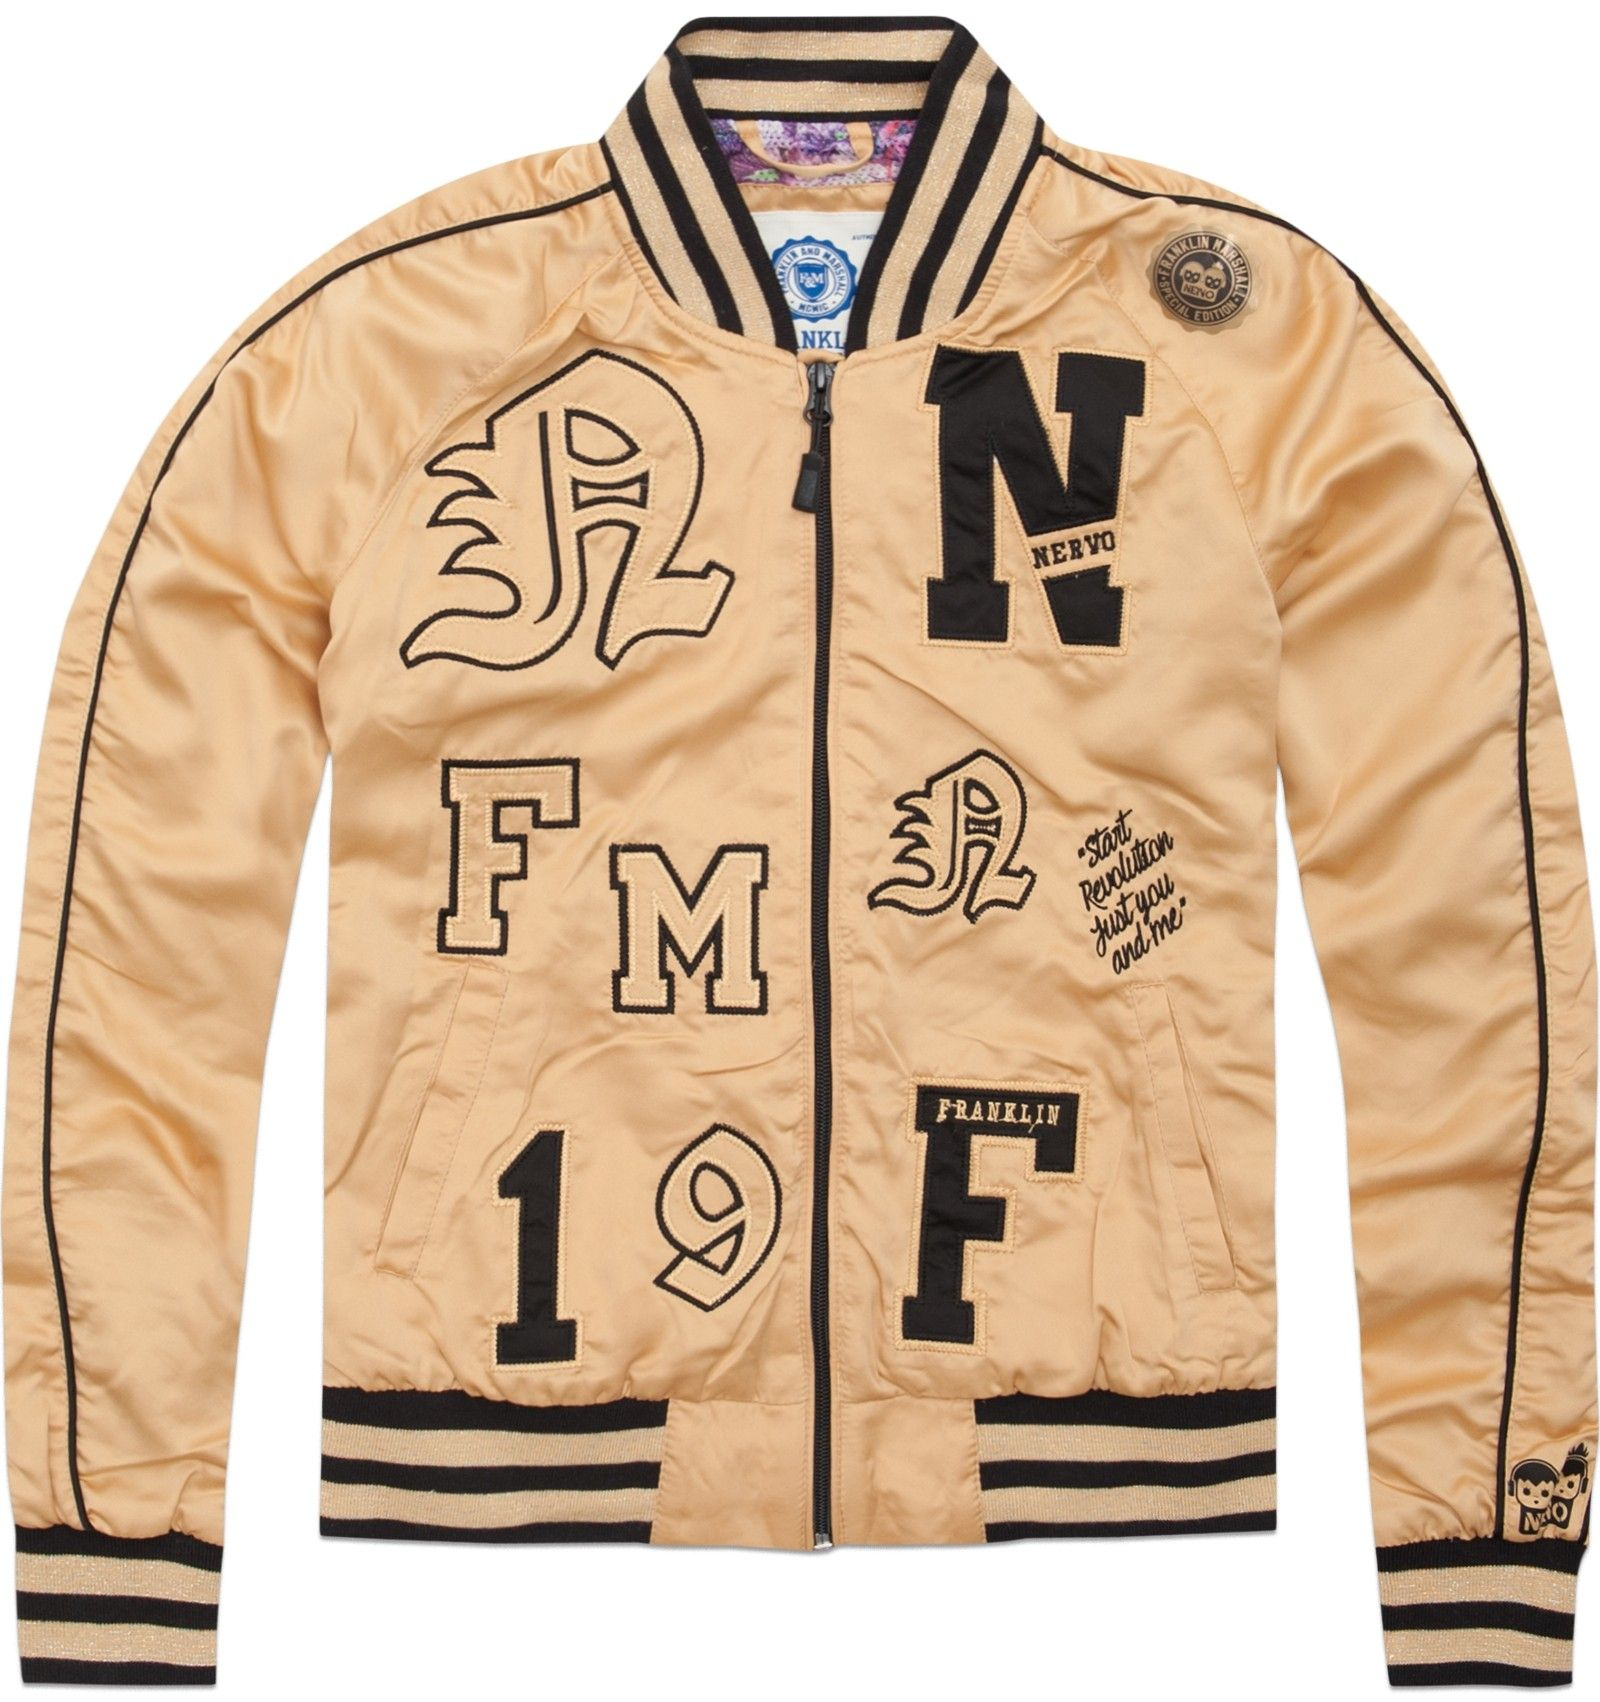 reputable site cf423 3666f NERVO Capsule - Women's varsity style jacket | Graphic ...